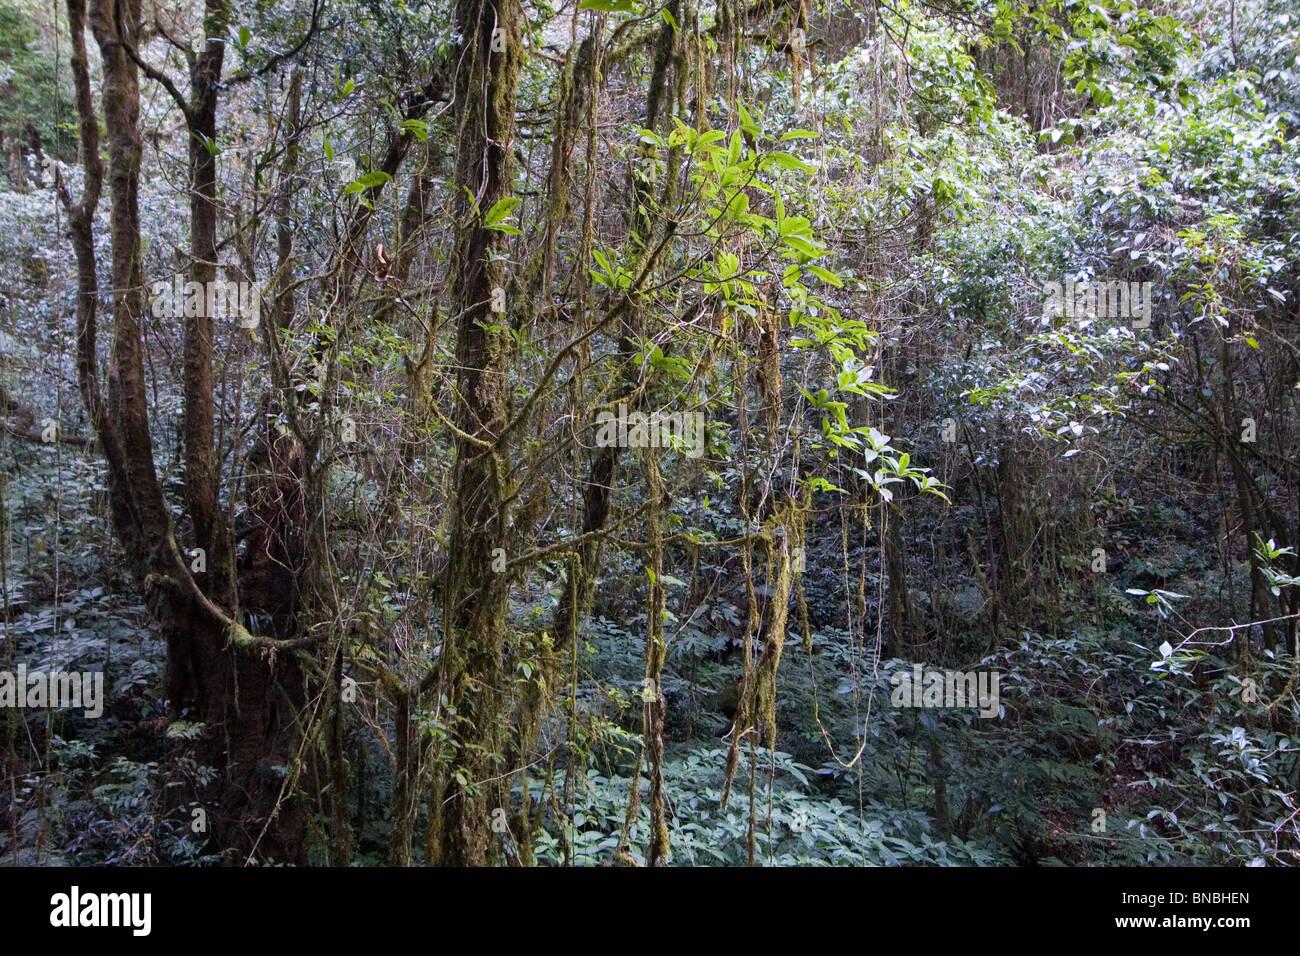 Montane Wald in einem feuchten Sphagnum Moor, Ang Ka Naturlehrpfad, Doi Inthanon Nationalpark, Thailand Stockbild